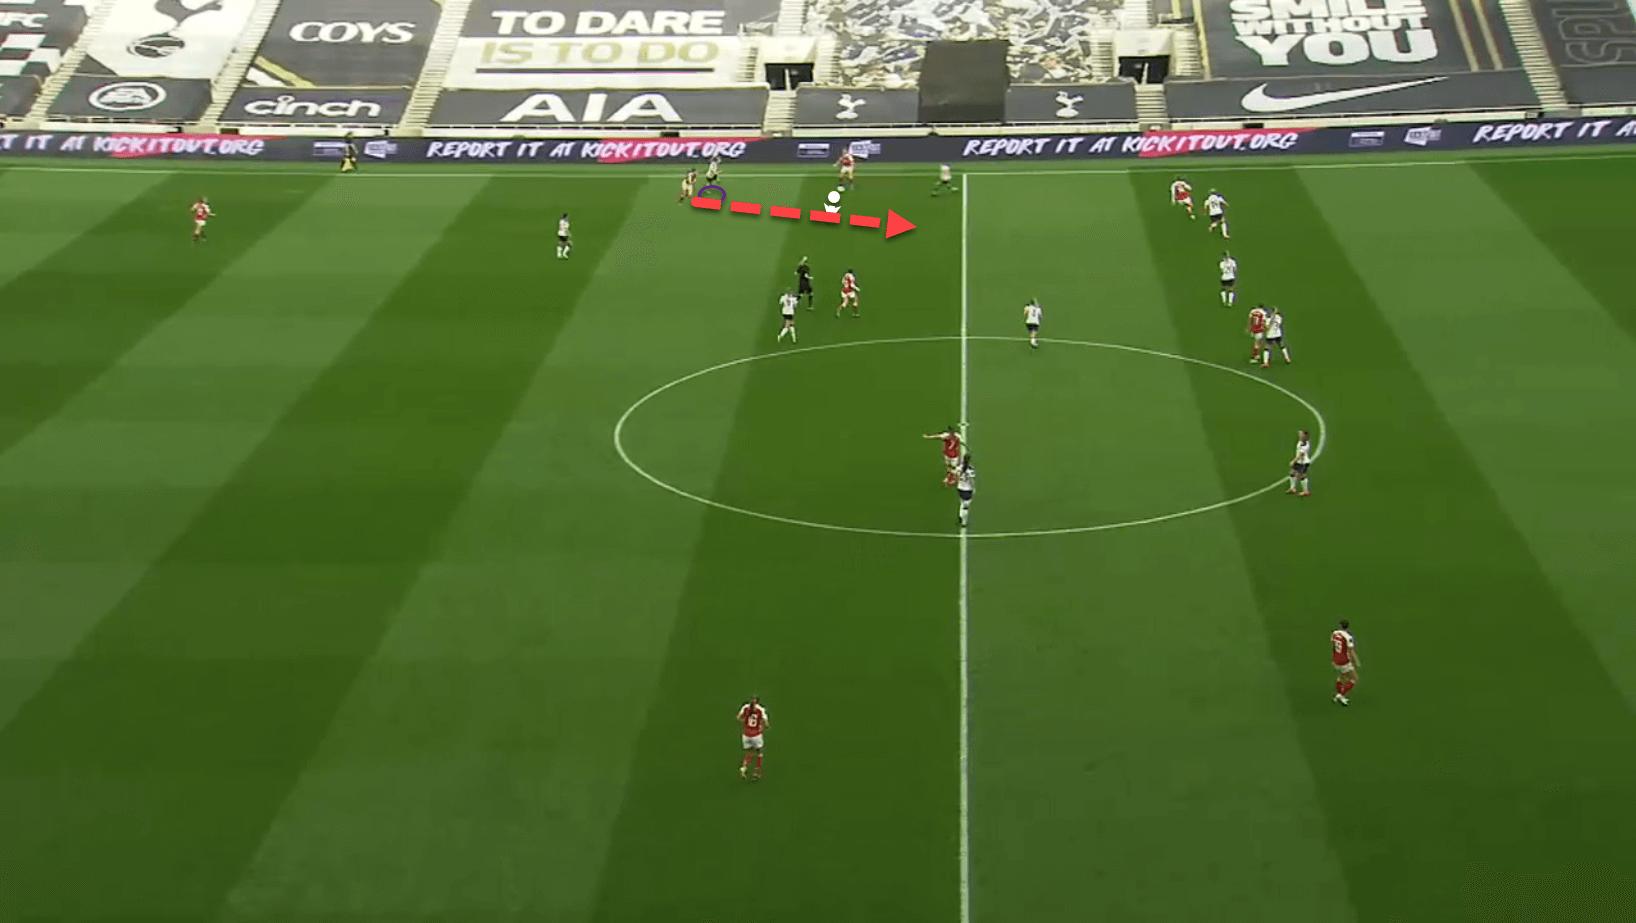 FAWSL 2020/21: Tottenham Women vs Arsenal Women - tactical analysis tactics